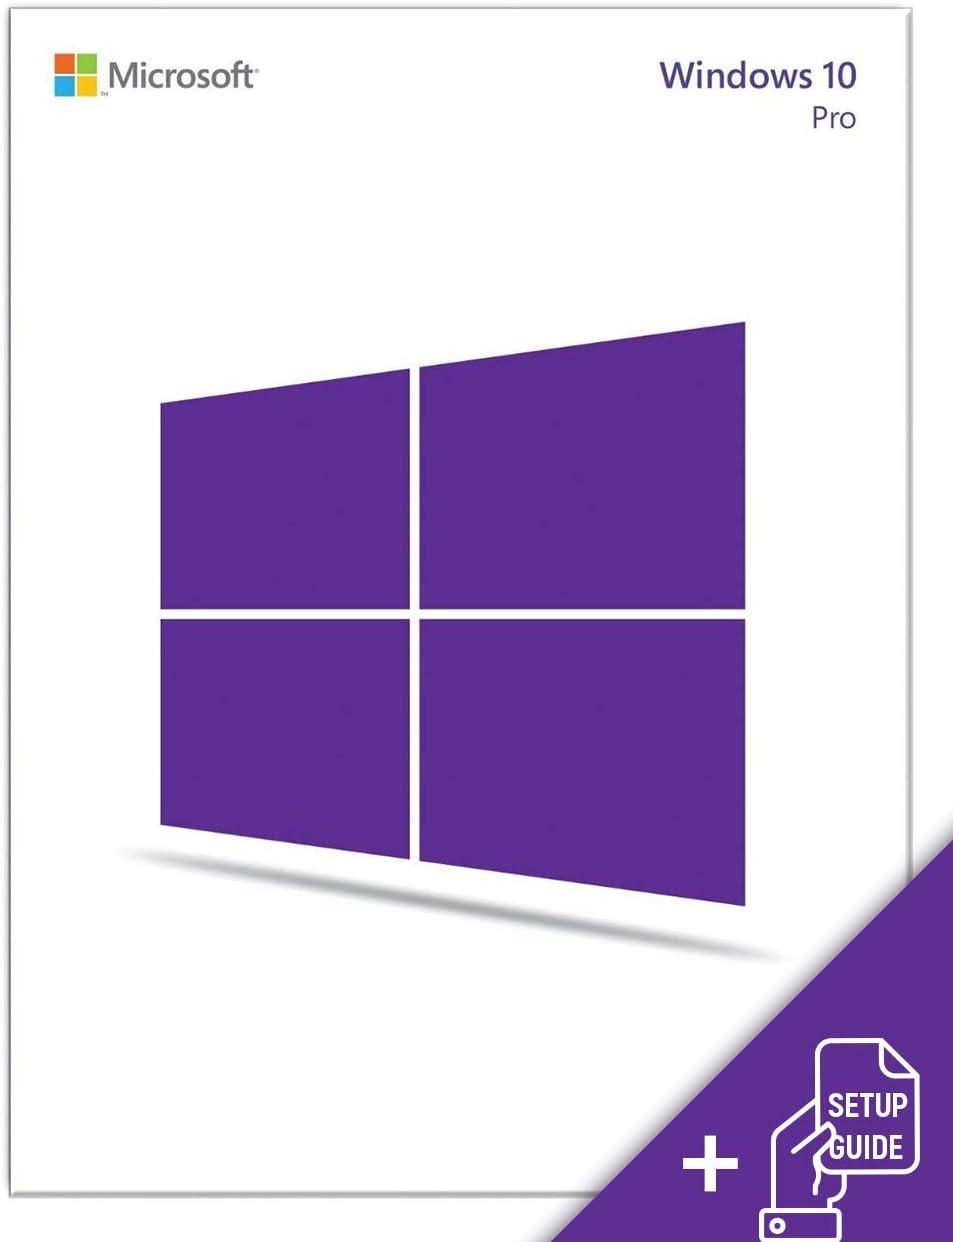 Windows10 Professional USB 64/32 Flash Drive ENGLISH | Bundled with Setup Guide